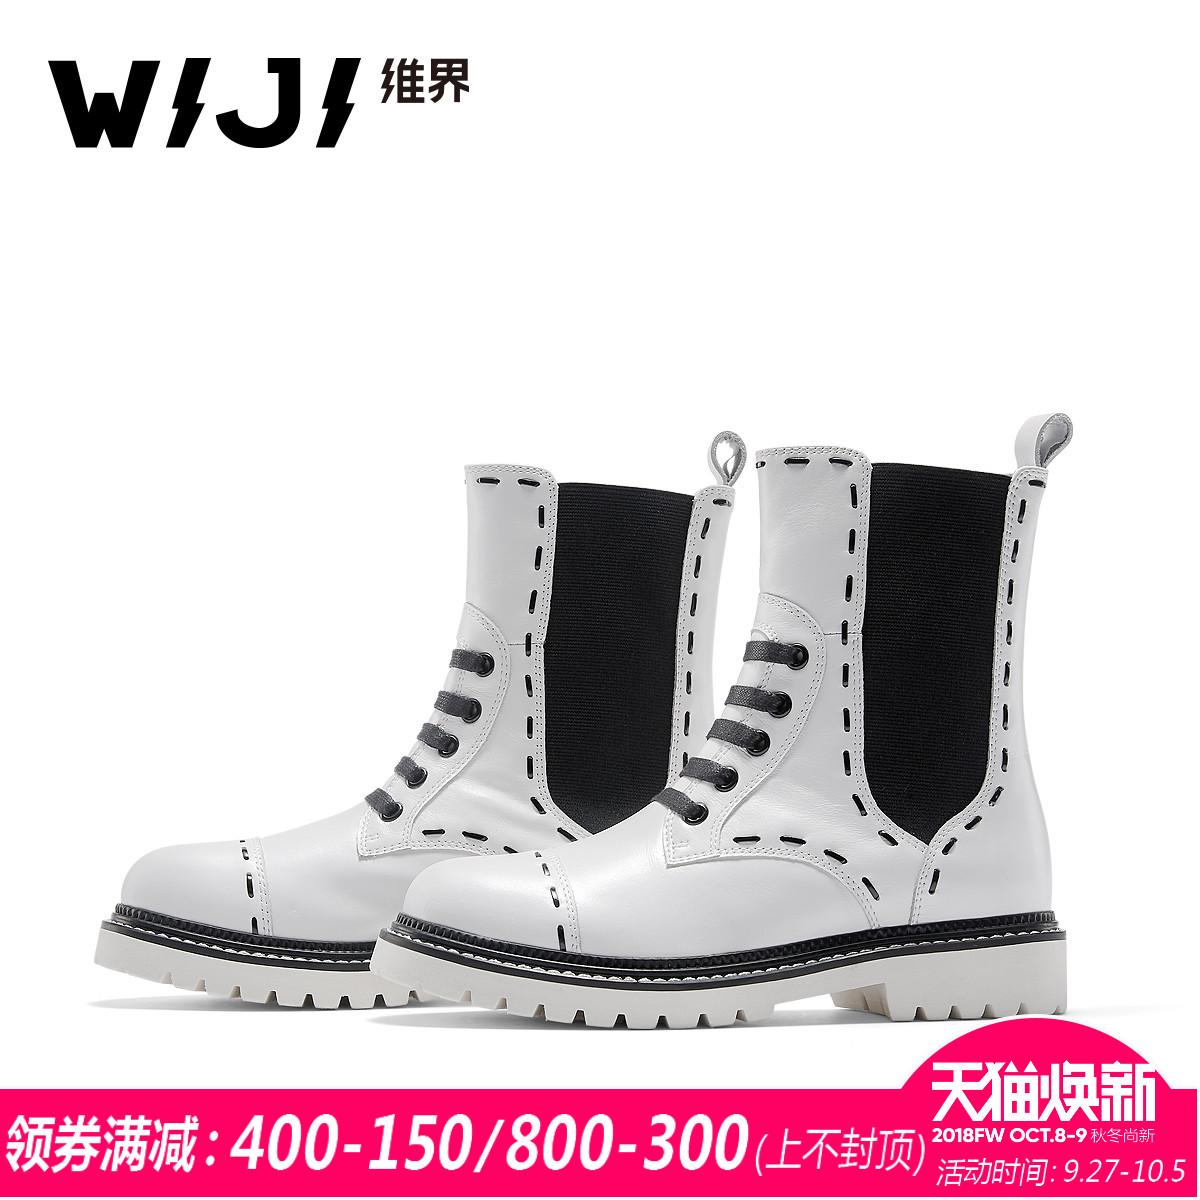 WIJI女鞋2018韩版秋冬新款牛皮时尚高筒靴潮流高帮个性休闲马丁靴